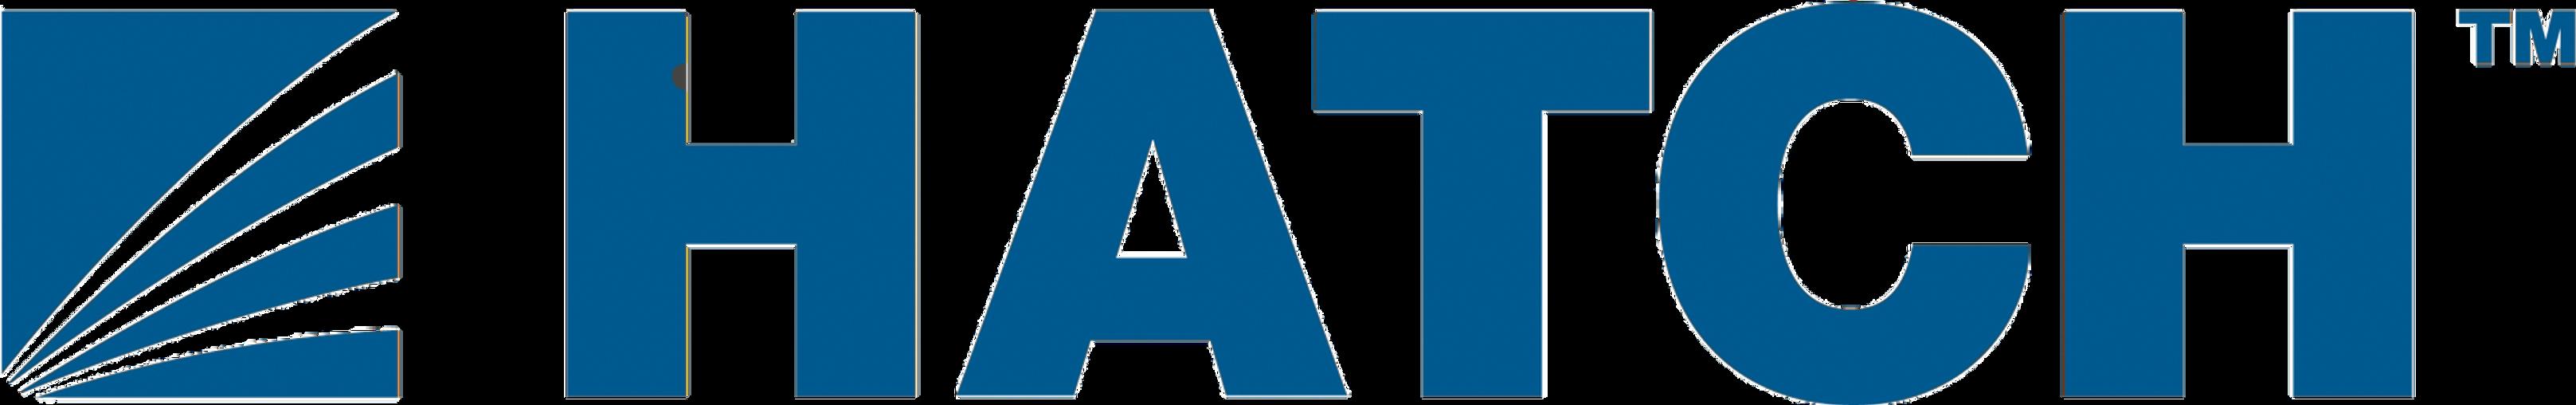 Hatch-Logo.png